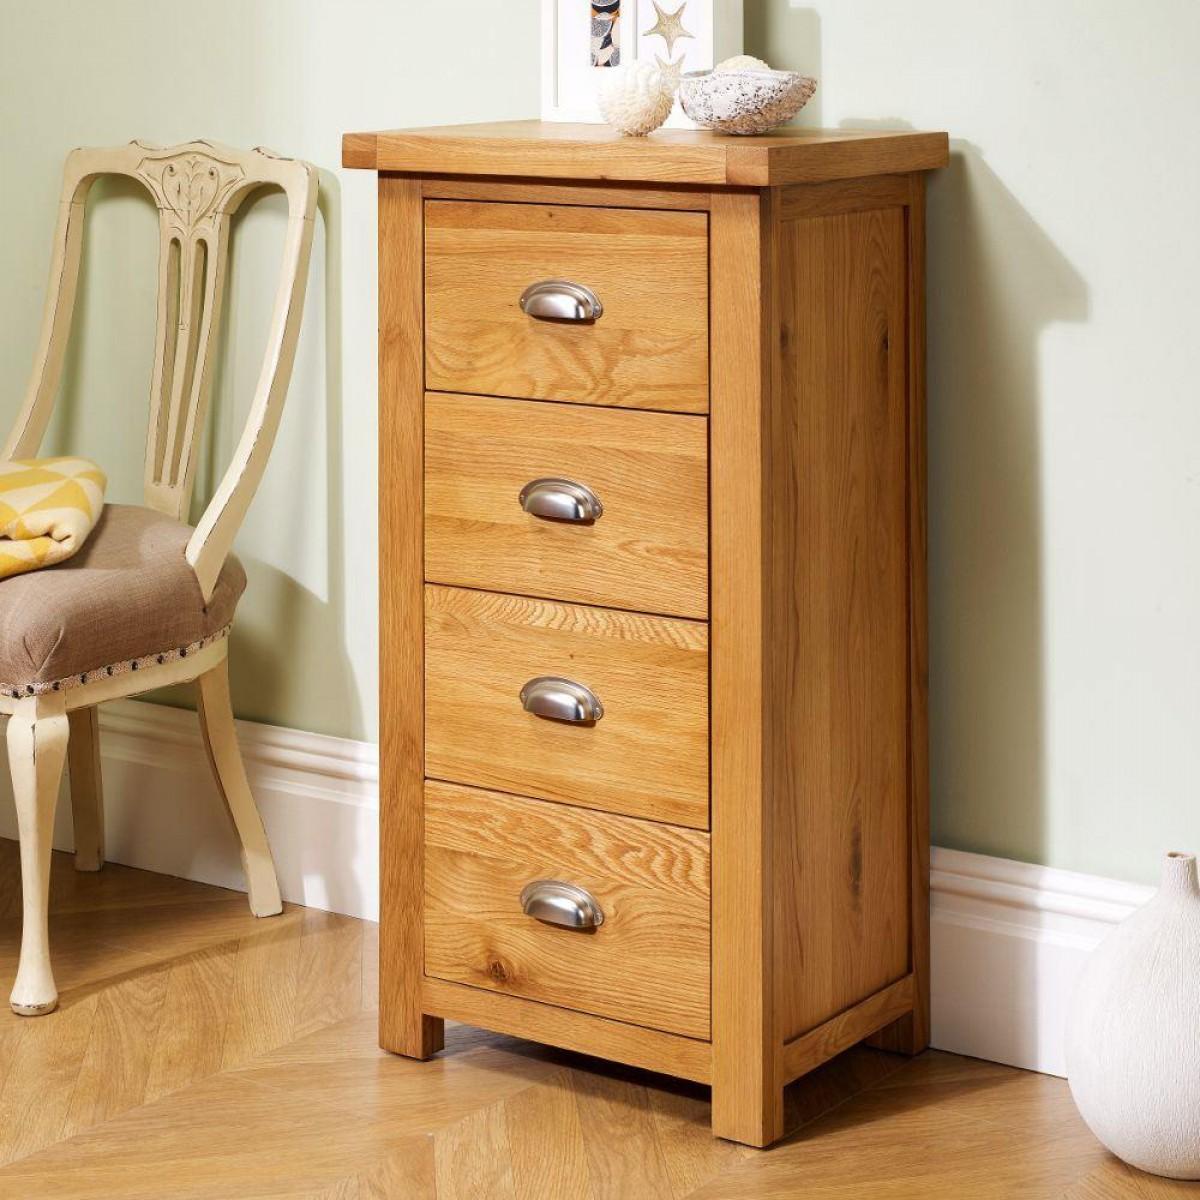 Woburn Oak Wooden 4 Drawer Narrow Chest